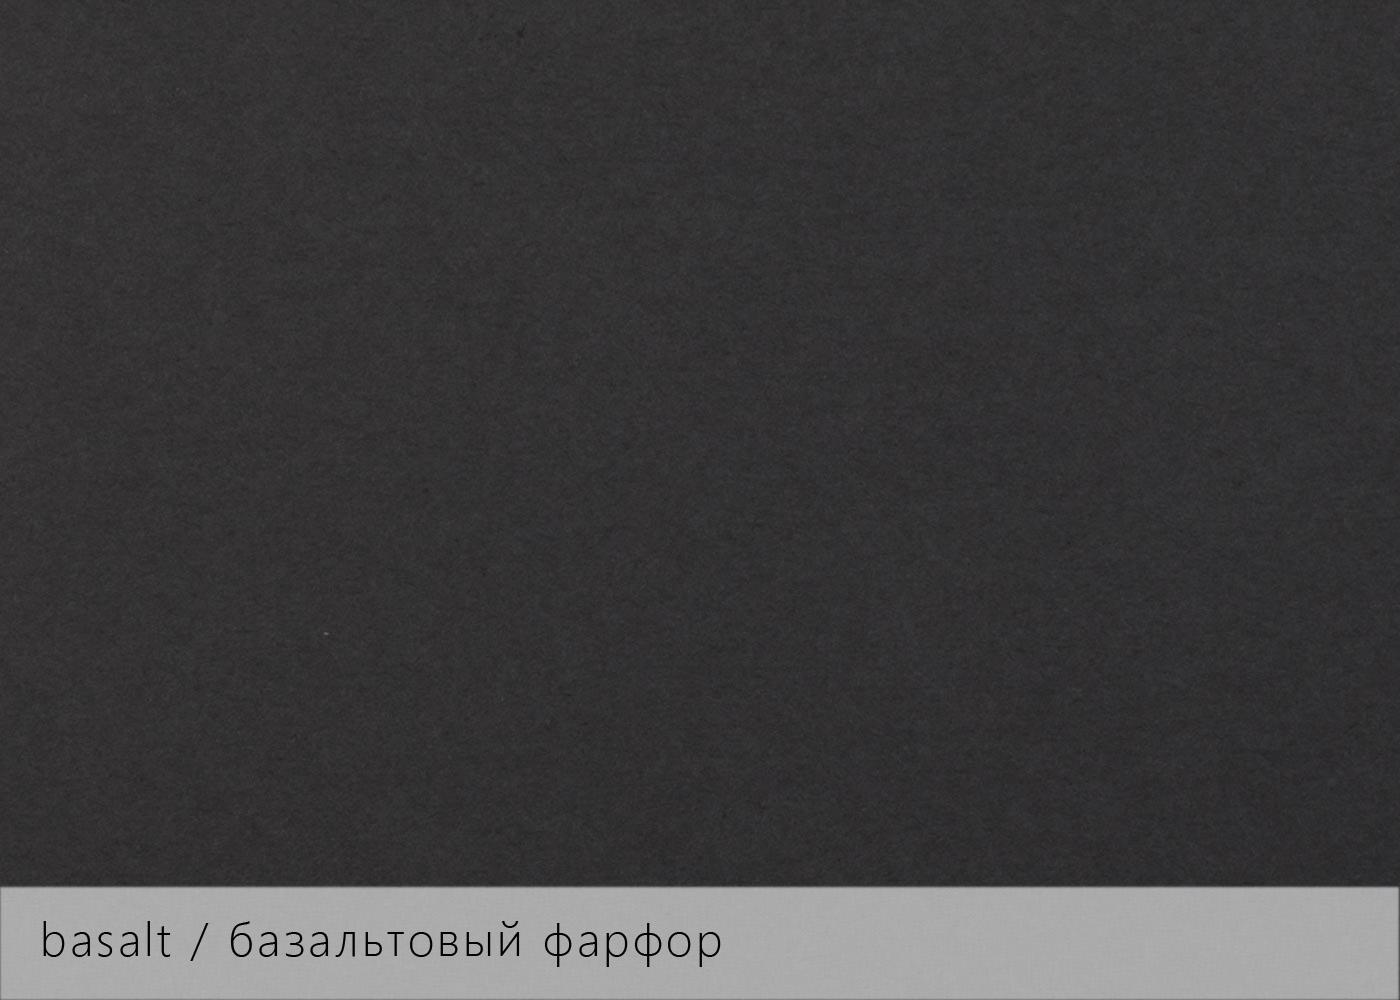 Keaykolour basalt - базальтовый фарфор